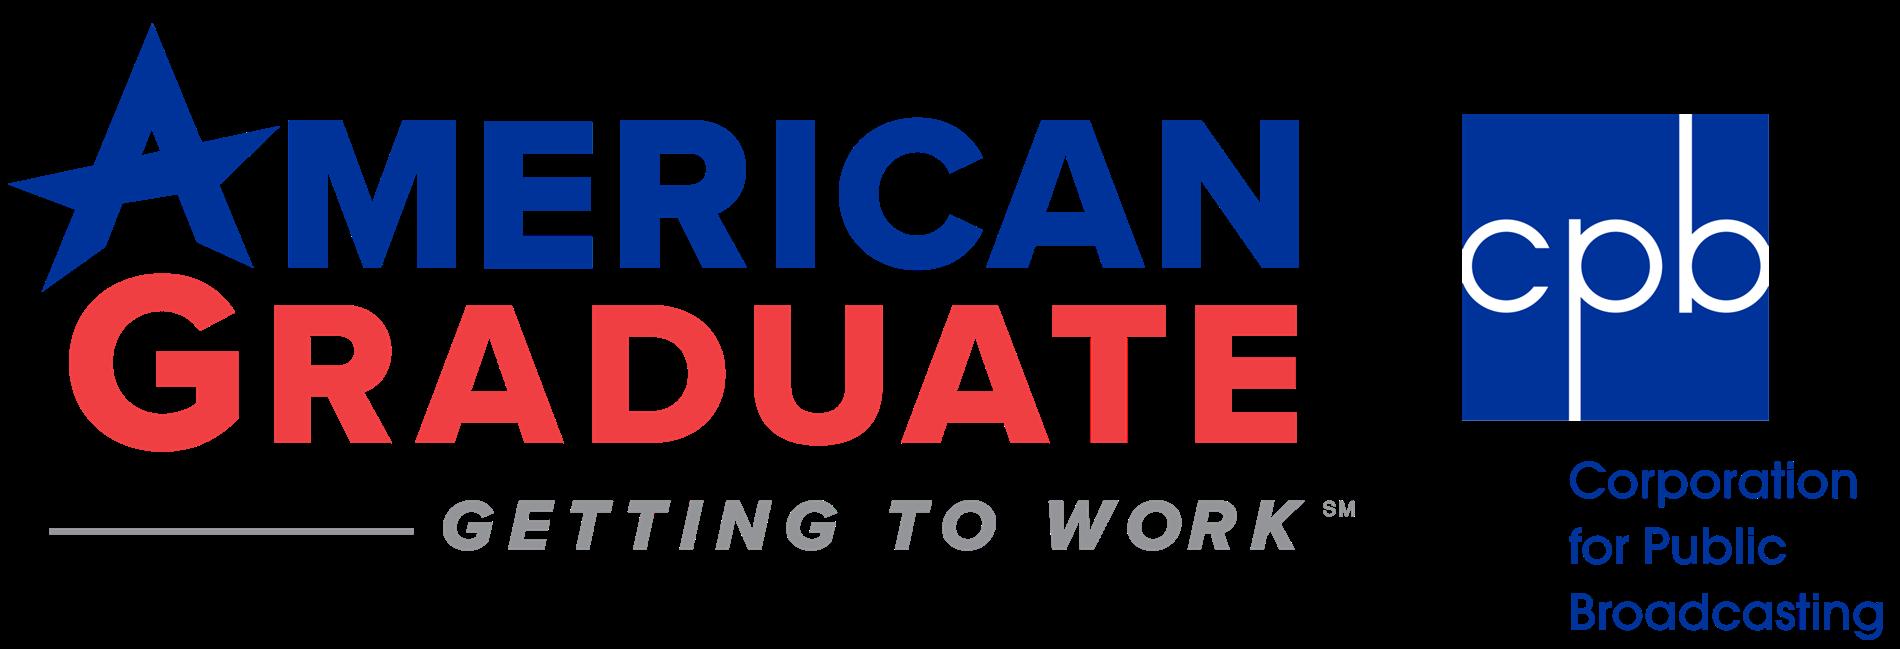 American Graduate Getting to work initiative link